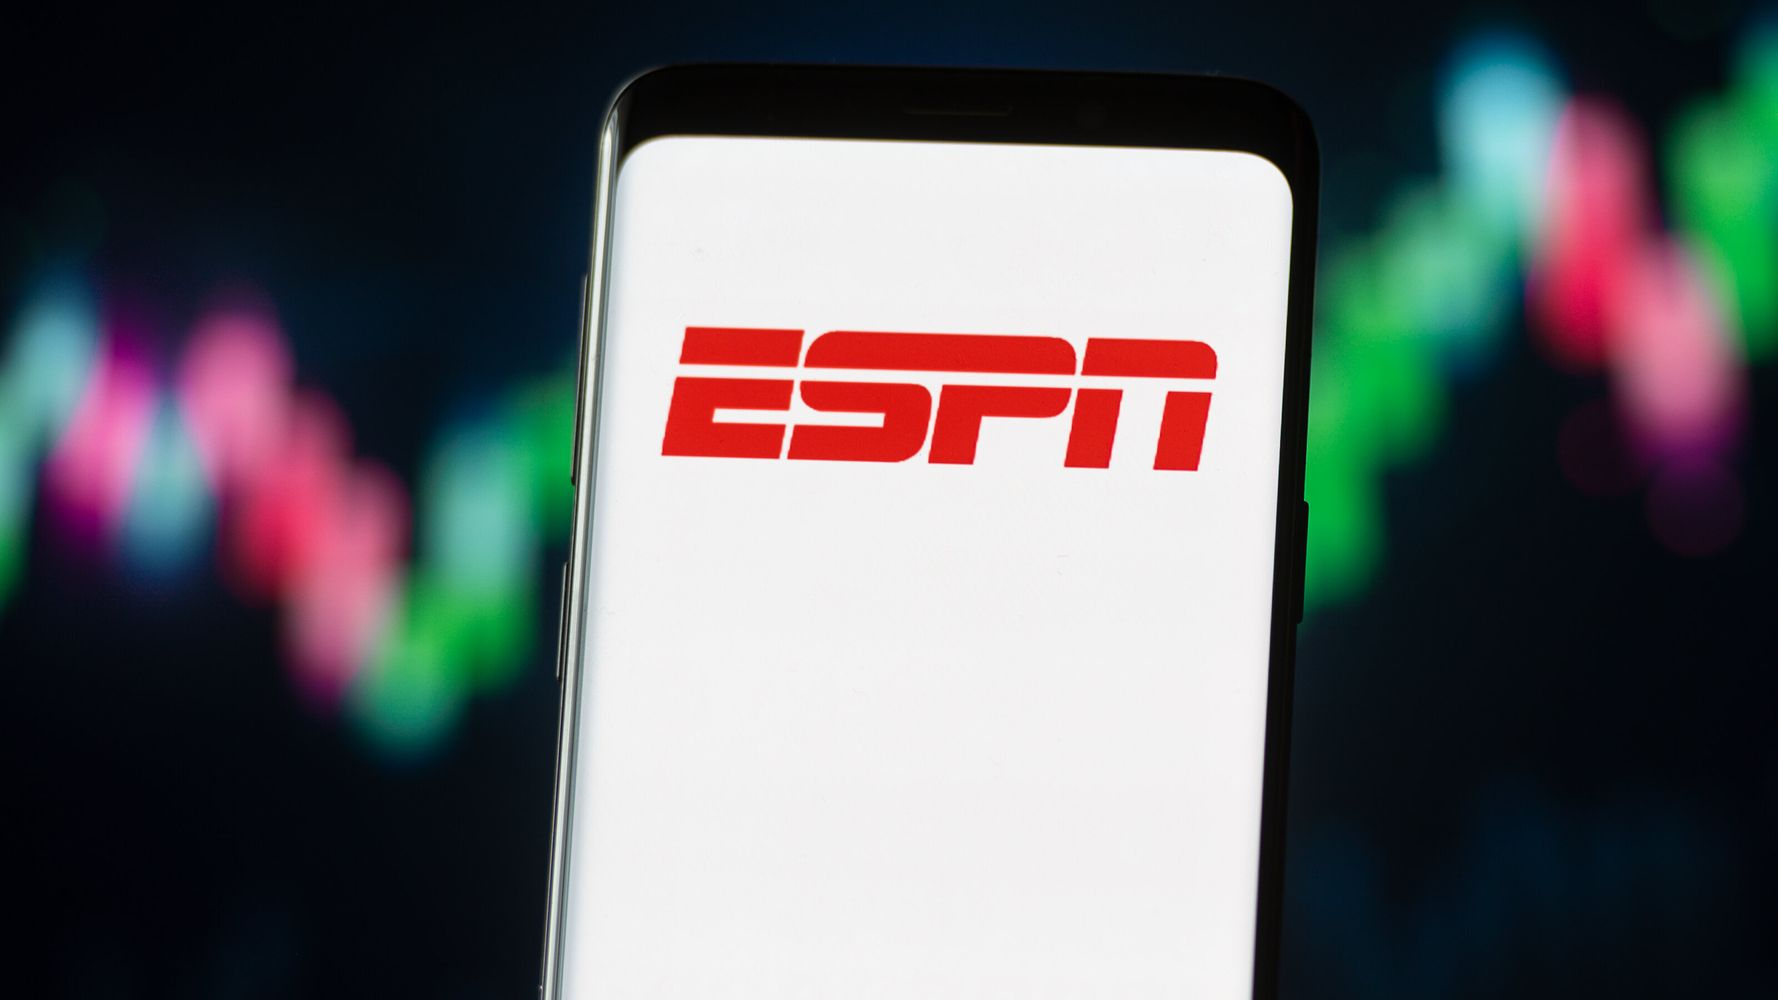 ESPN Announces Massive Layoffs Due To Coronavirus 'Disruption'